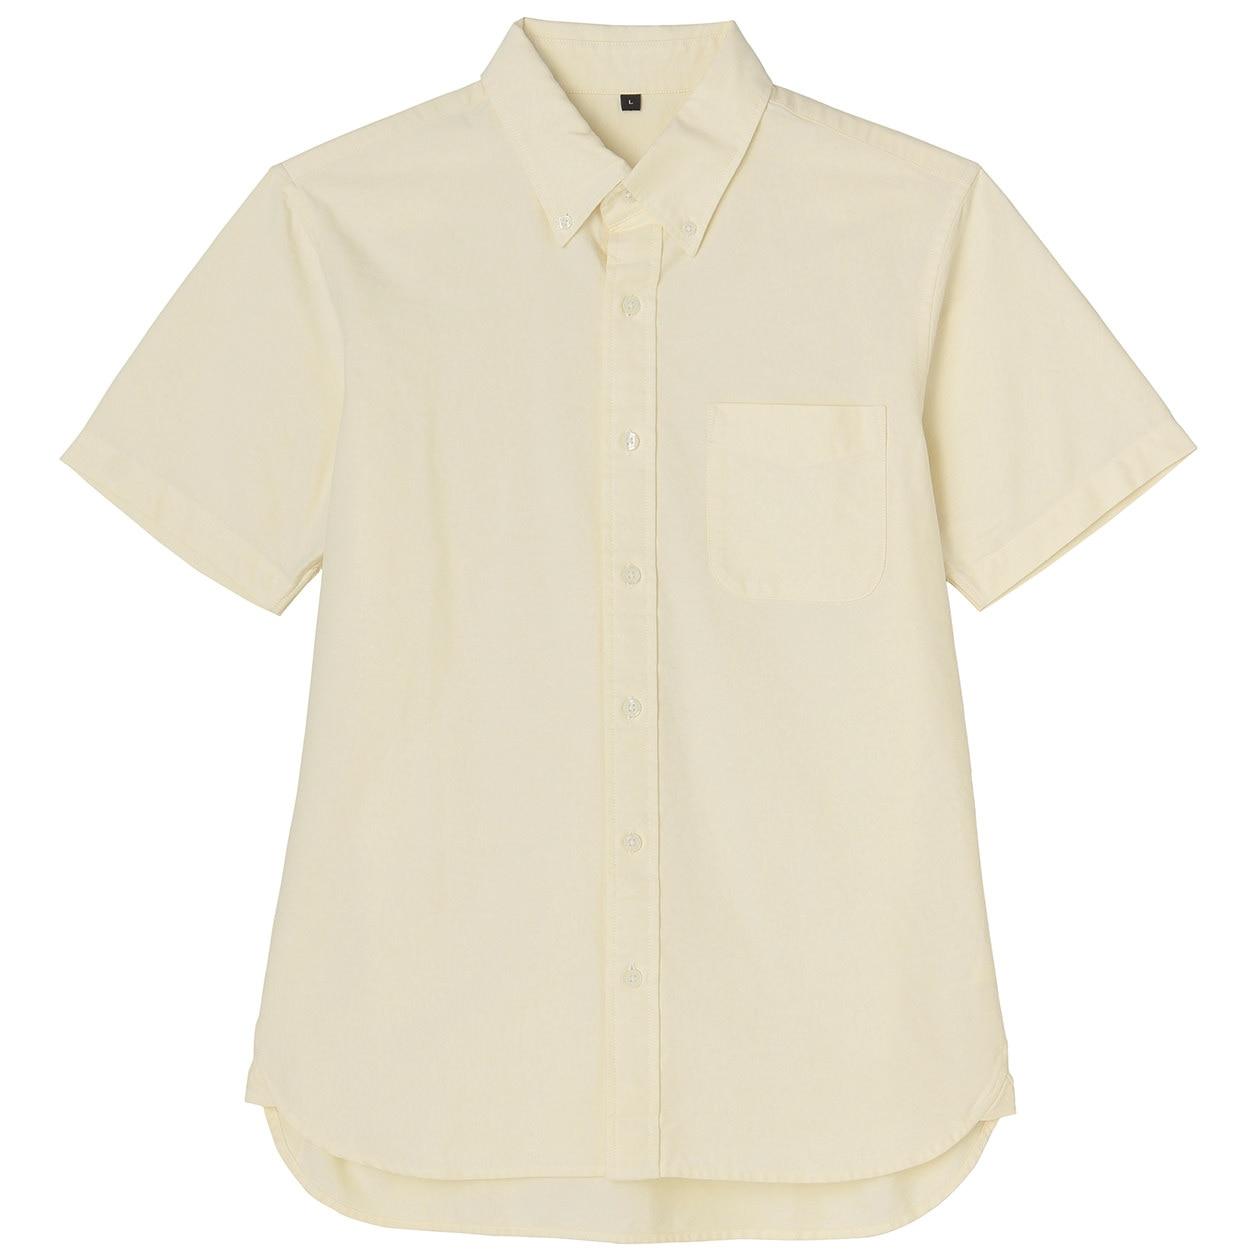 Organic Cotton Oxford Button Down S S Shirt Men M Yellow